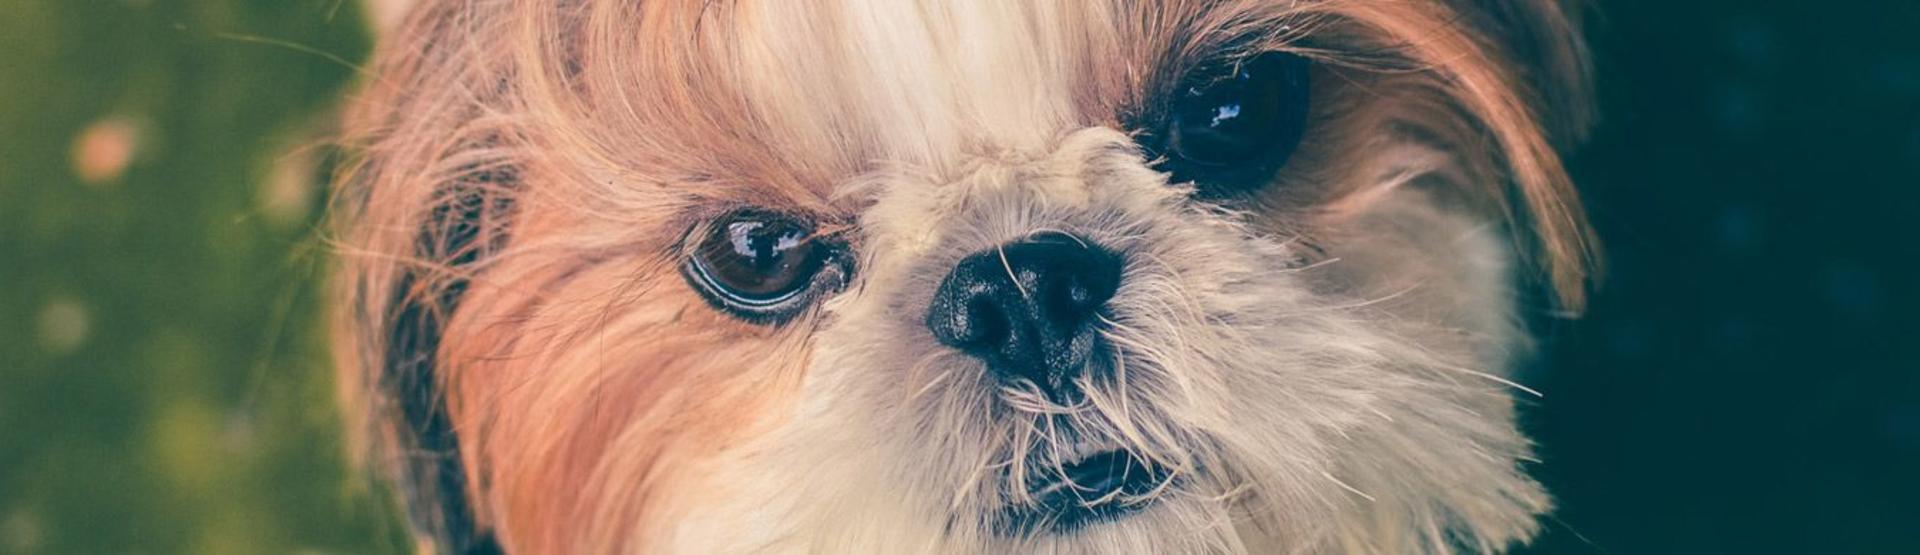 doggroomheader__hero.jpg